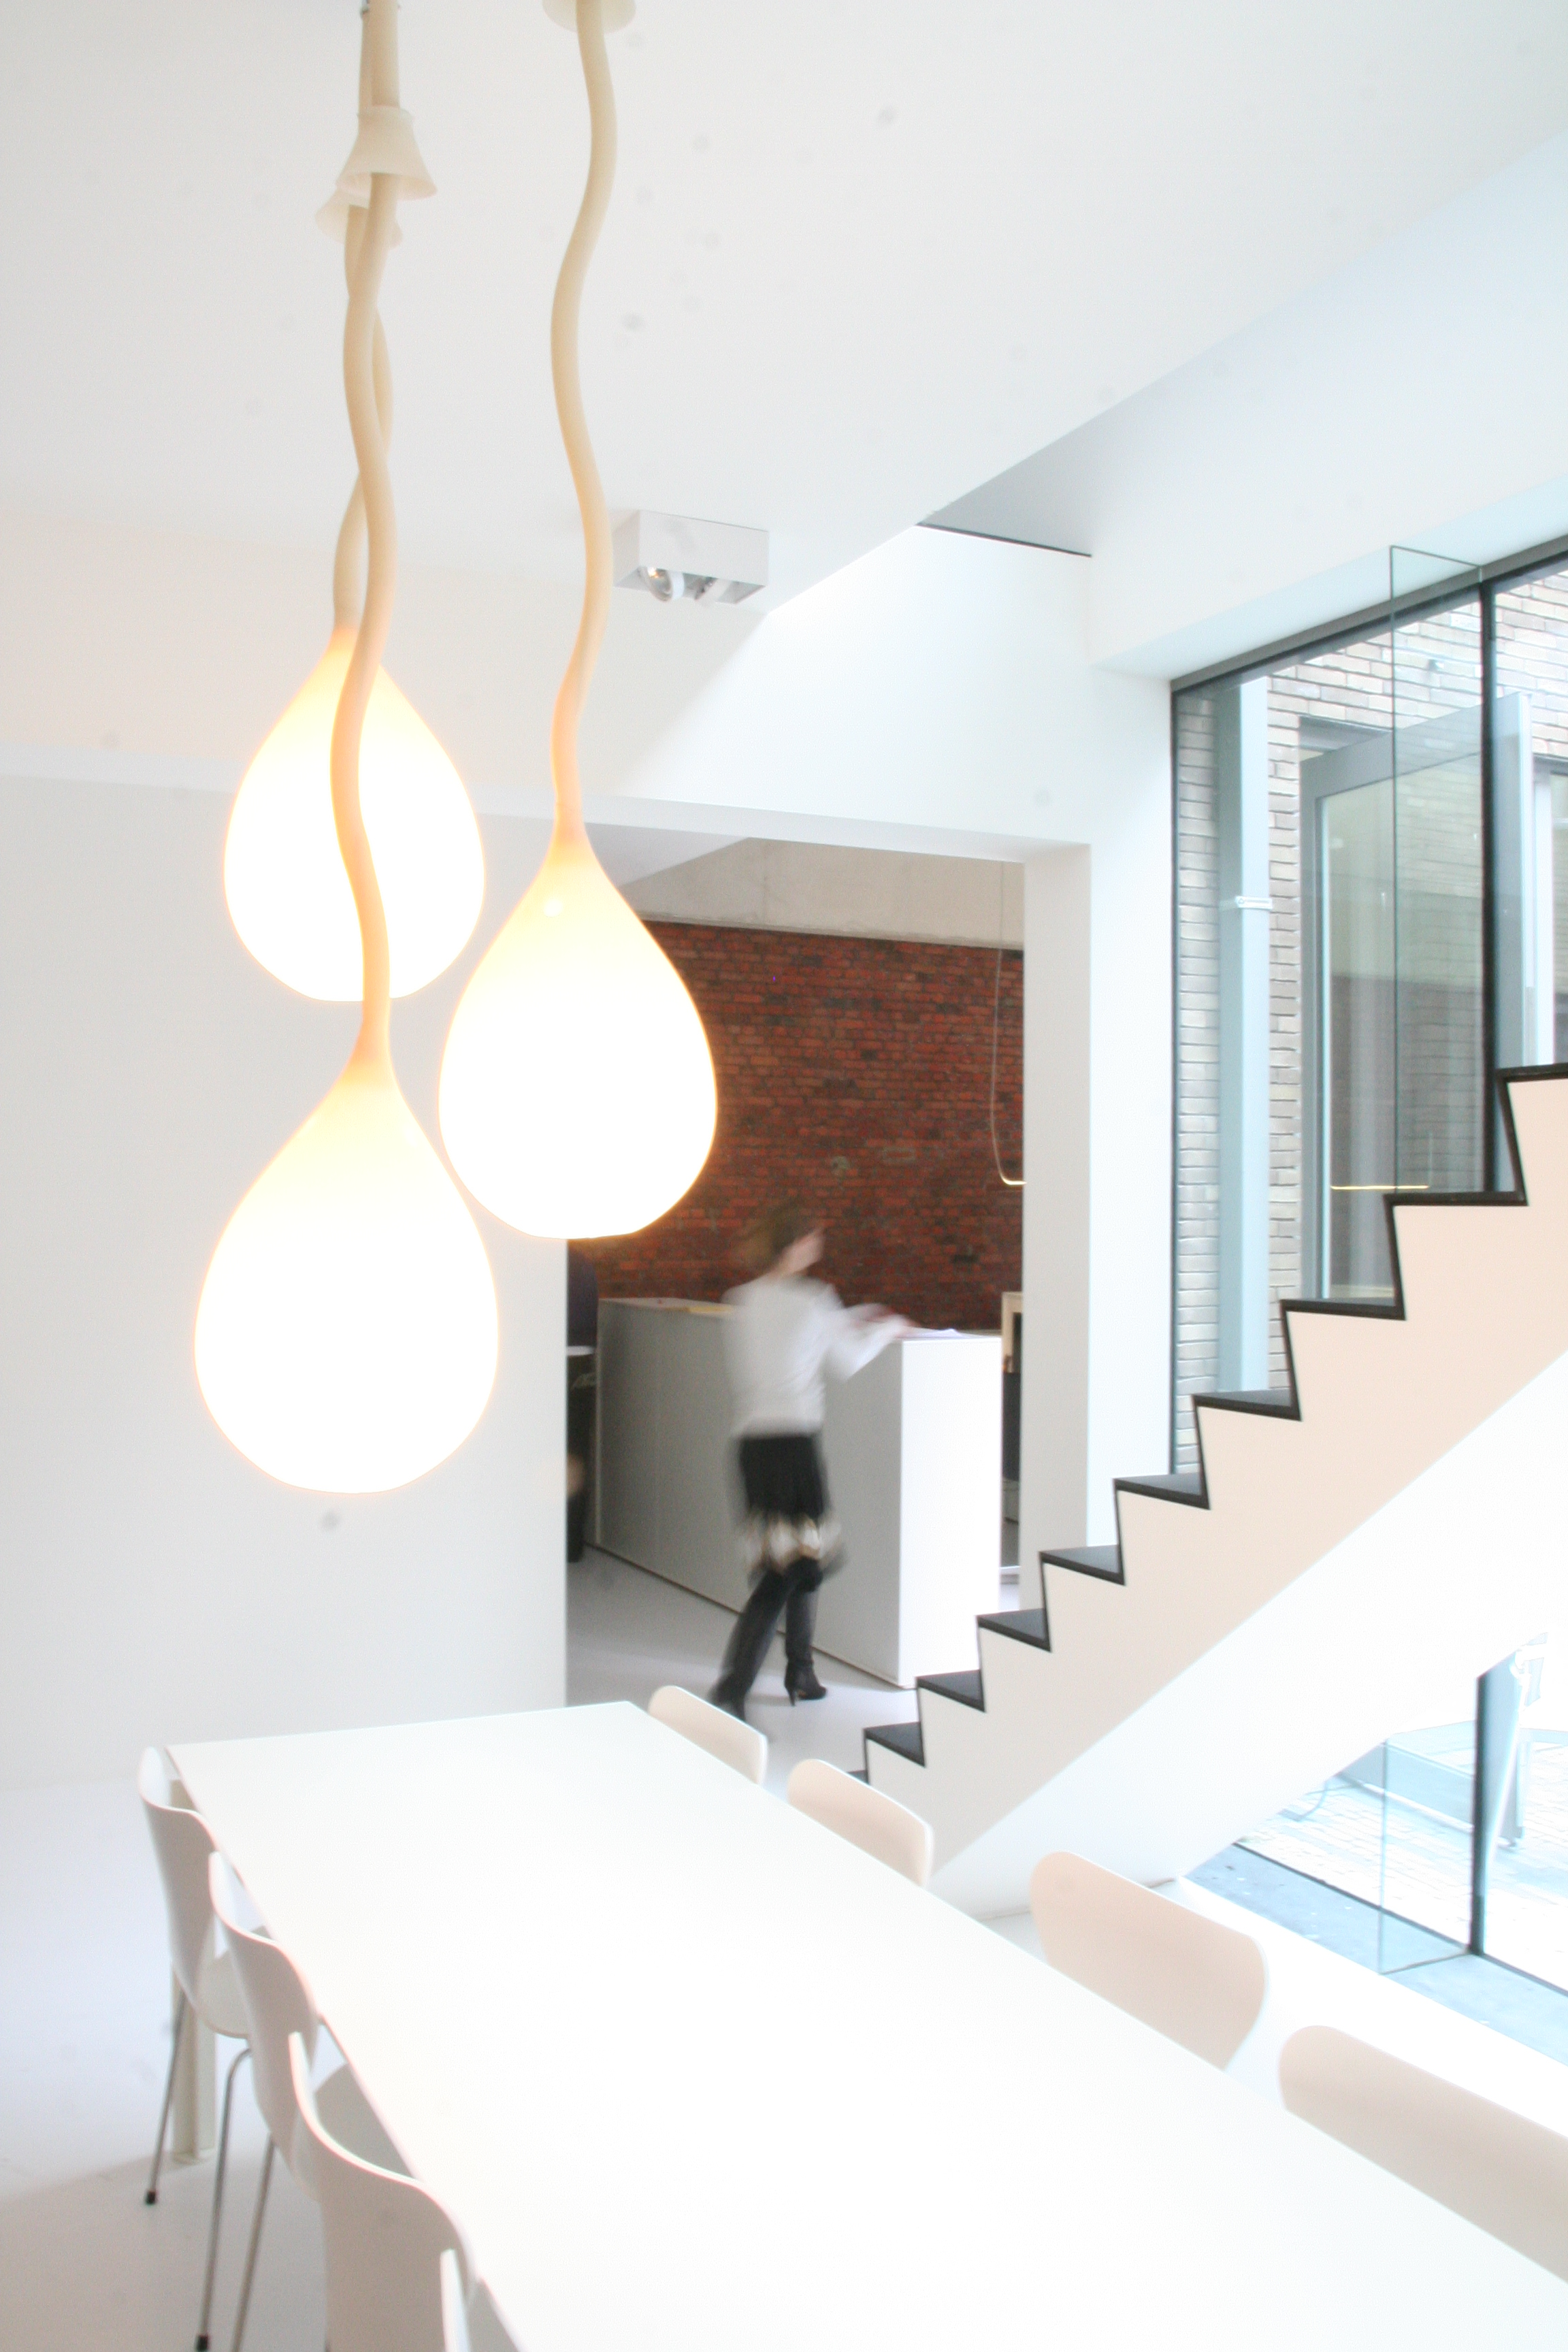 M2 ARCHITECTEN, architects office, Antwerp, Belgium